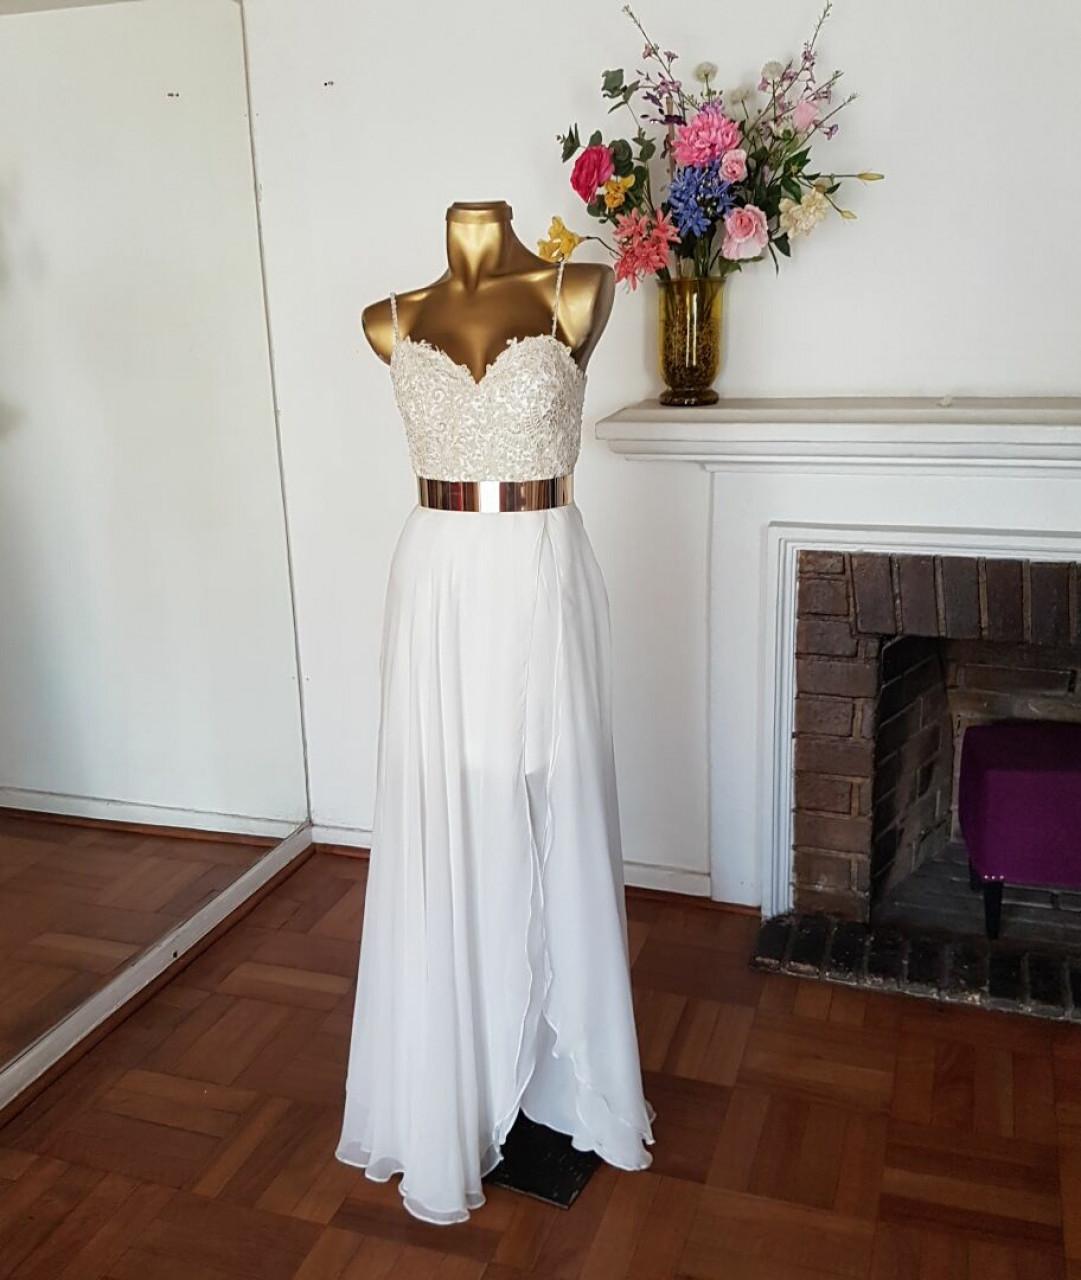 Vestidos de novia san fernando chile